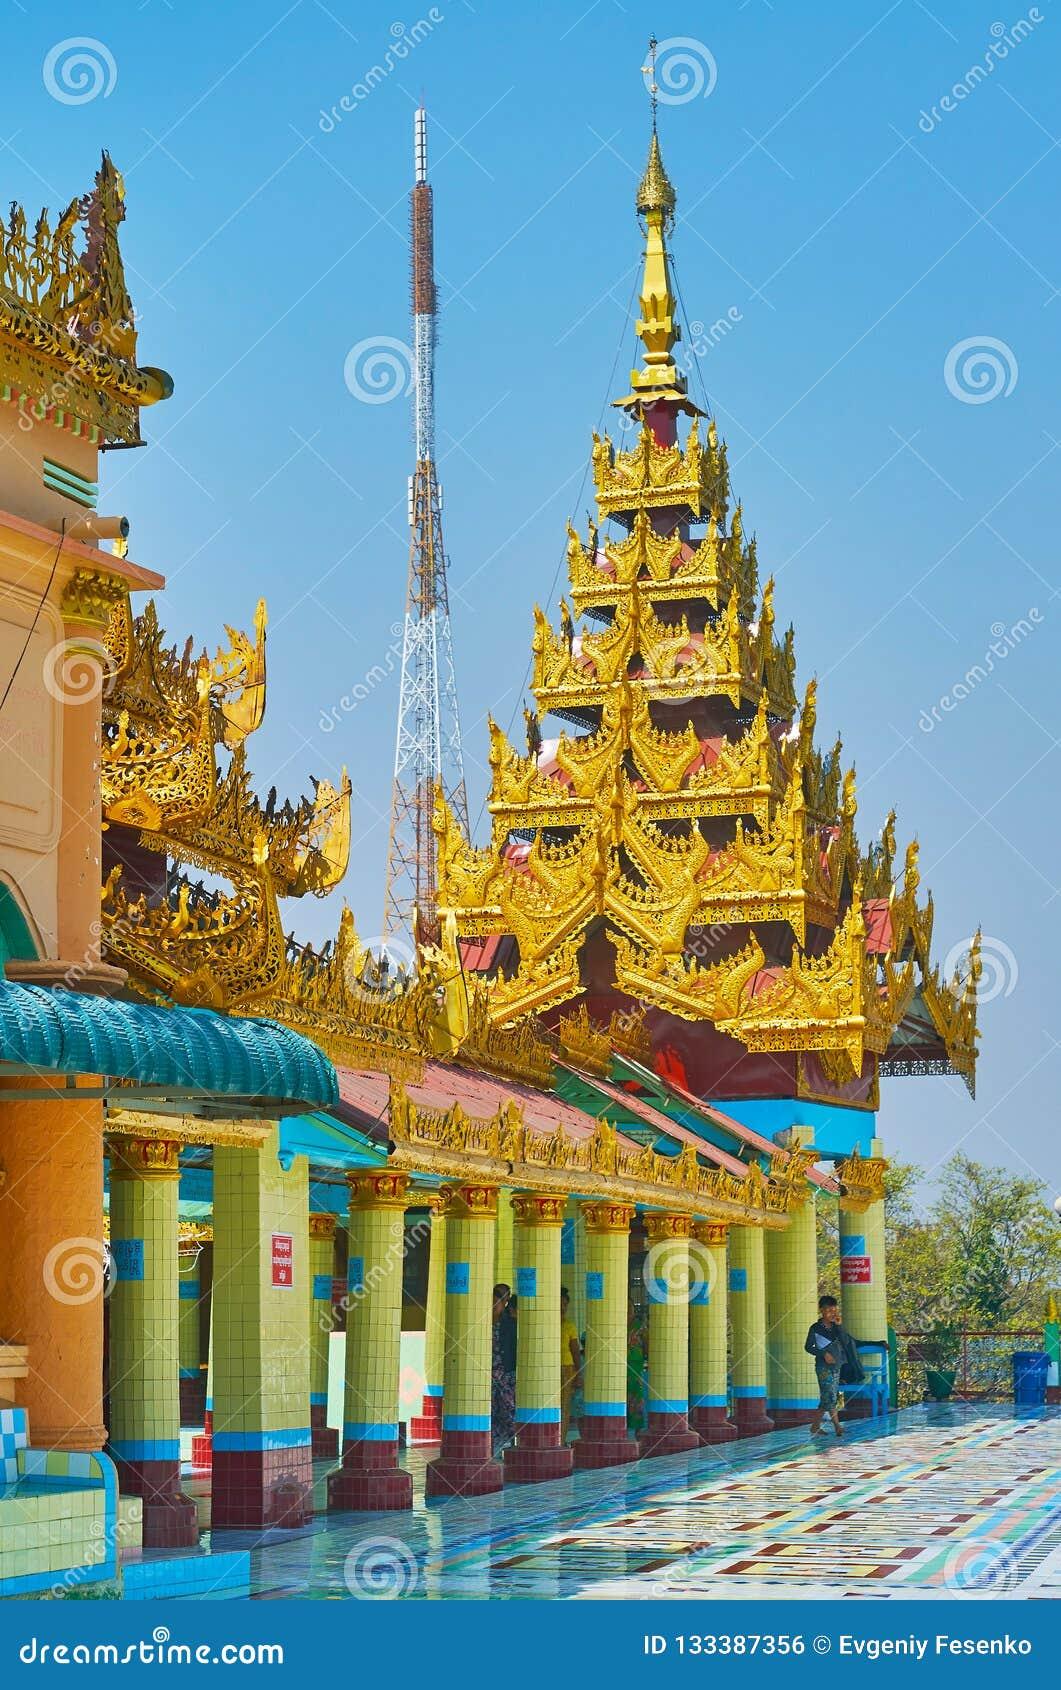 Le toit multi-étagé de pyatthat bientôt d Oo Ponya Shin Paya Summit Pagoda, Sagaing